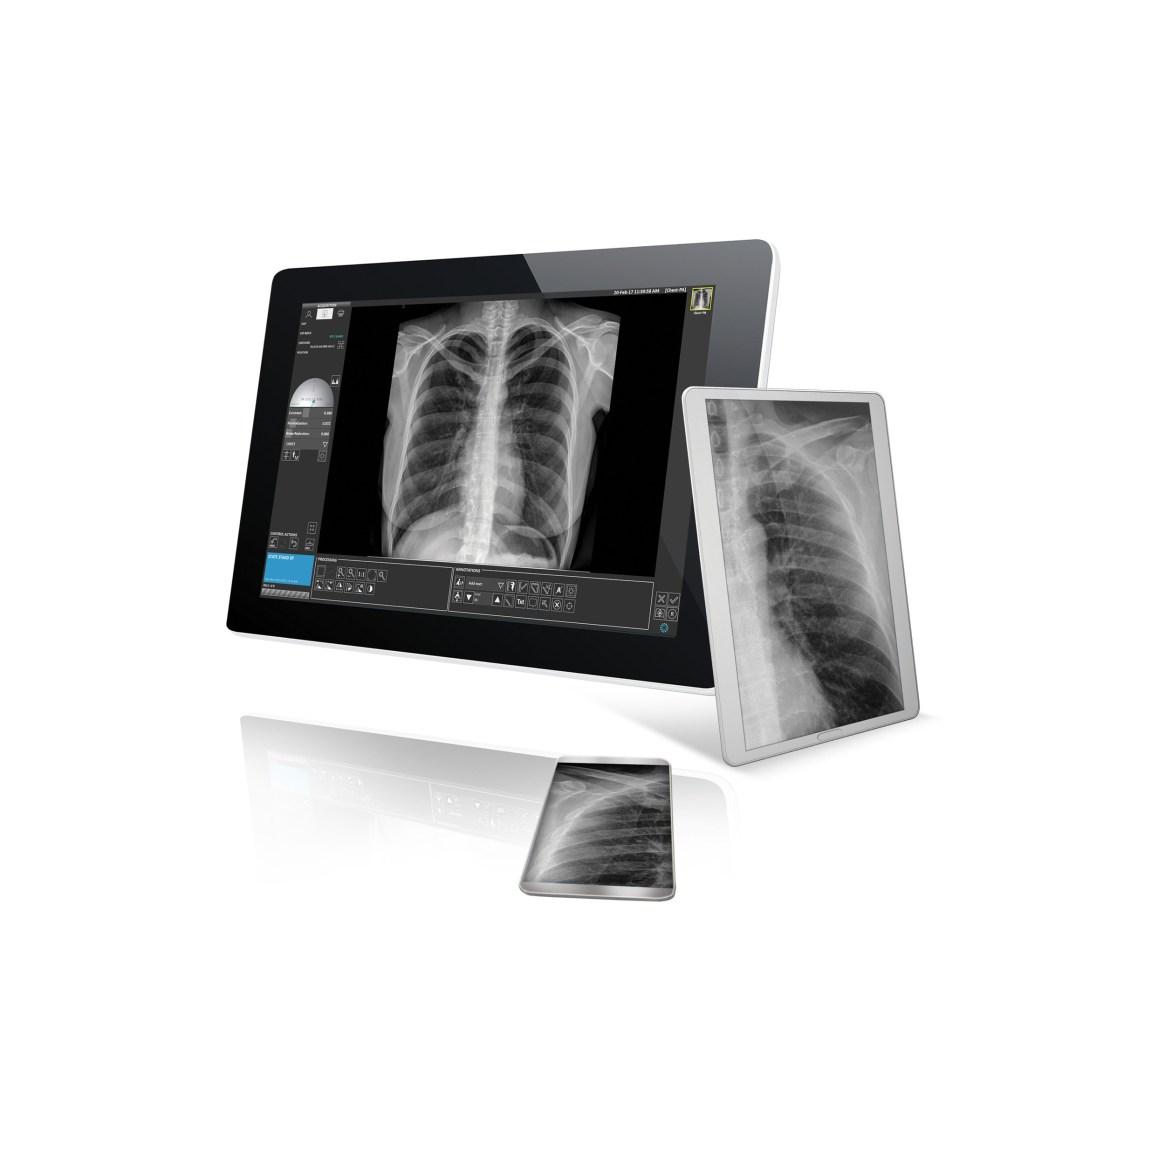 Digital Radiography imaging system